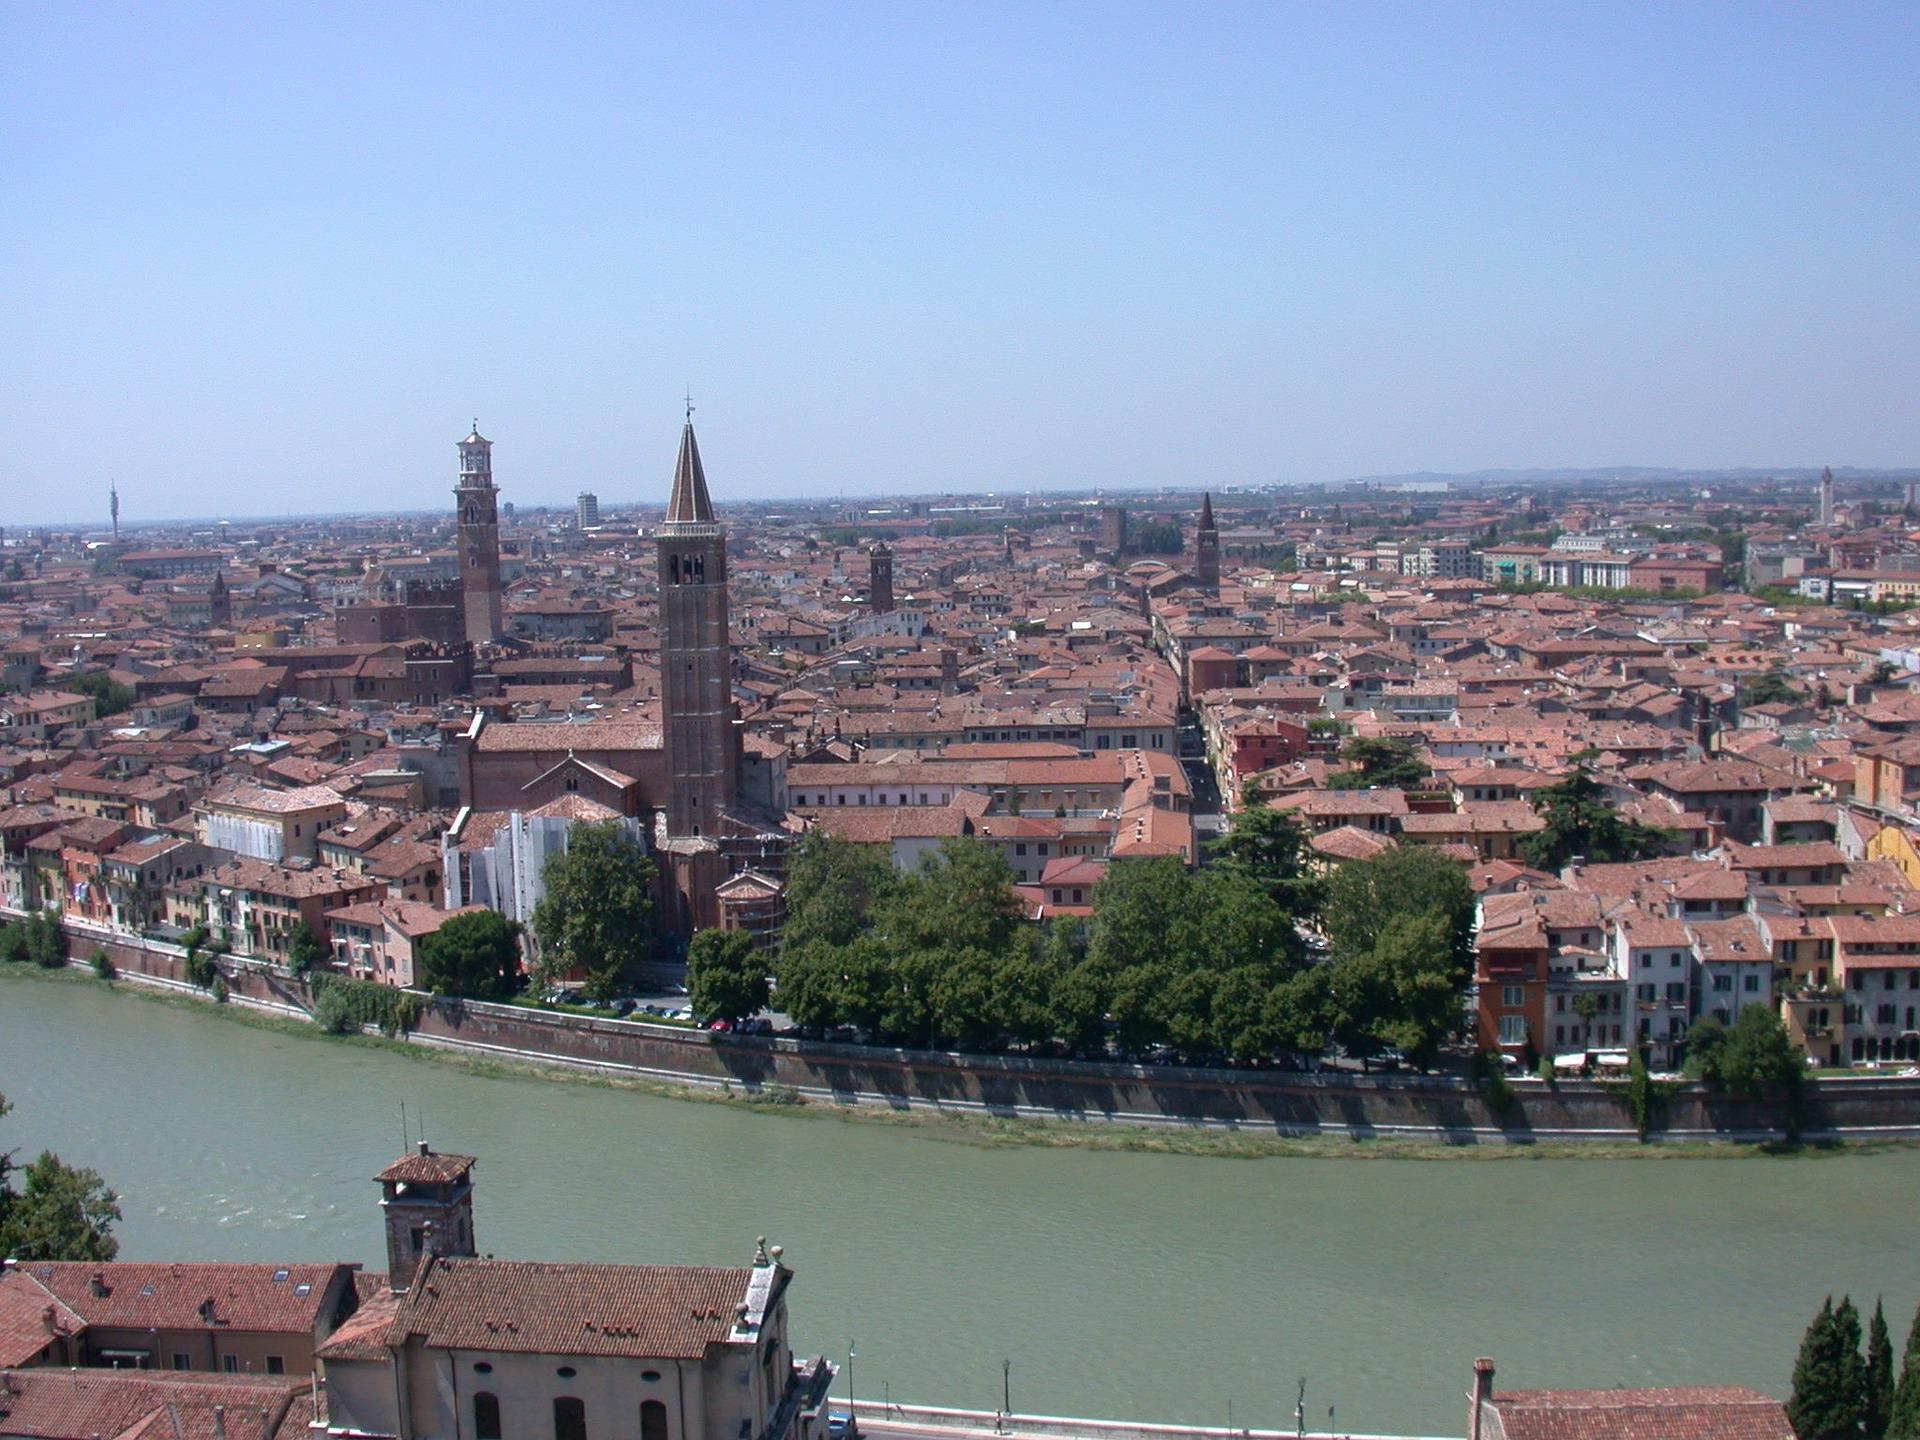 Verona - Image Credit